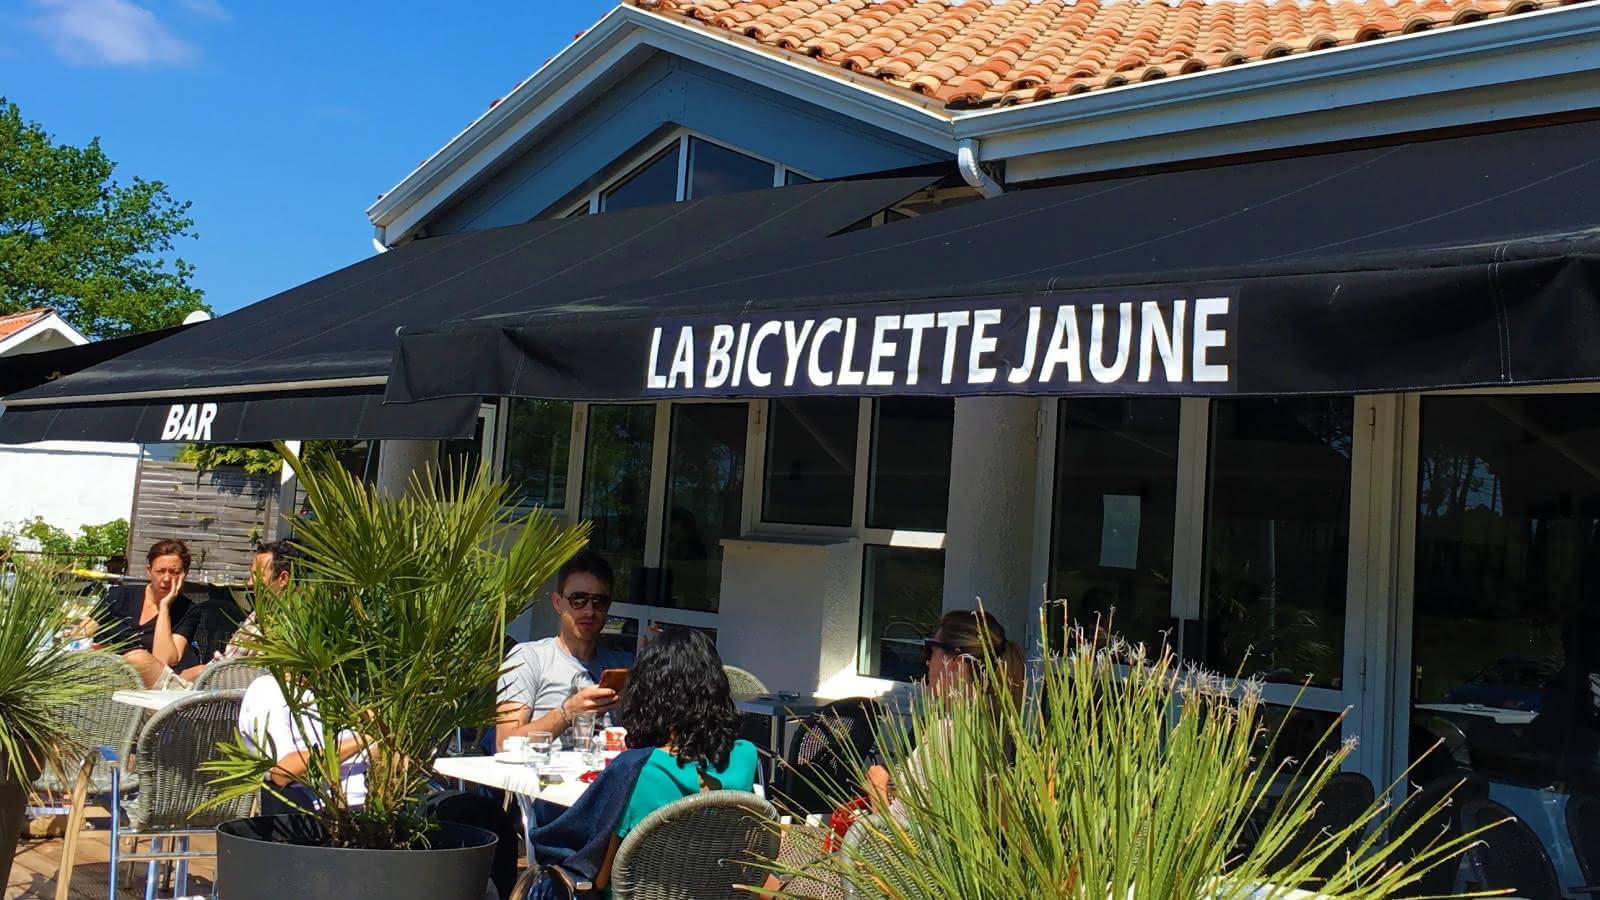 BICYCL JAUNE TERRASSE 2